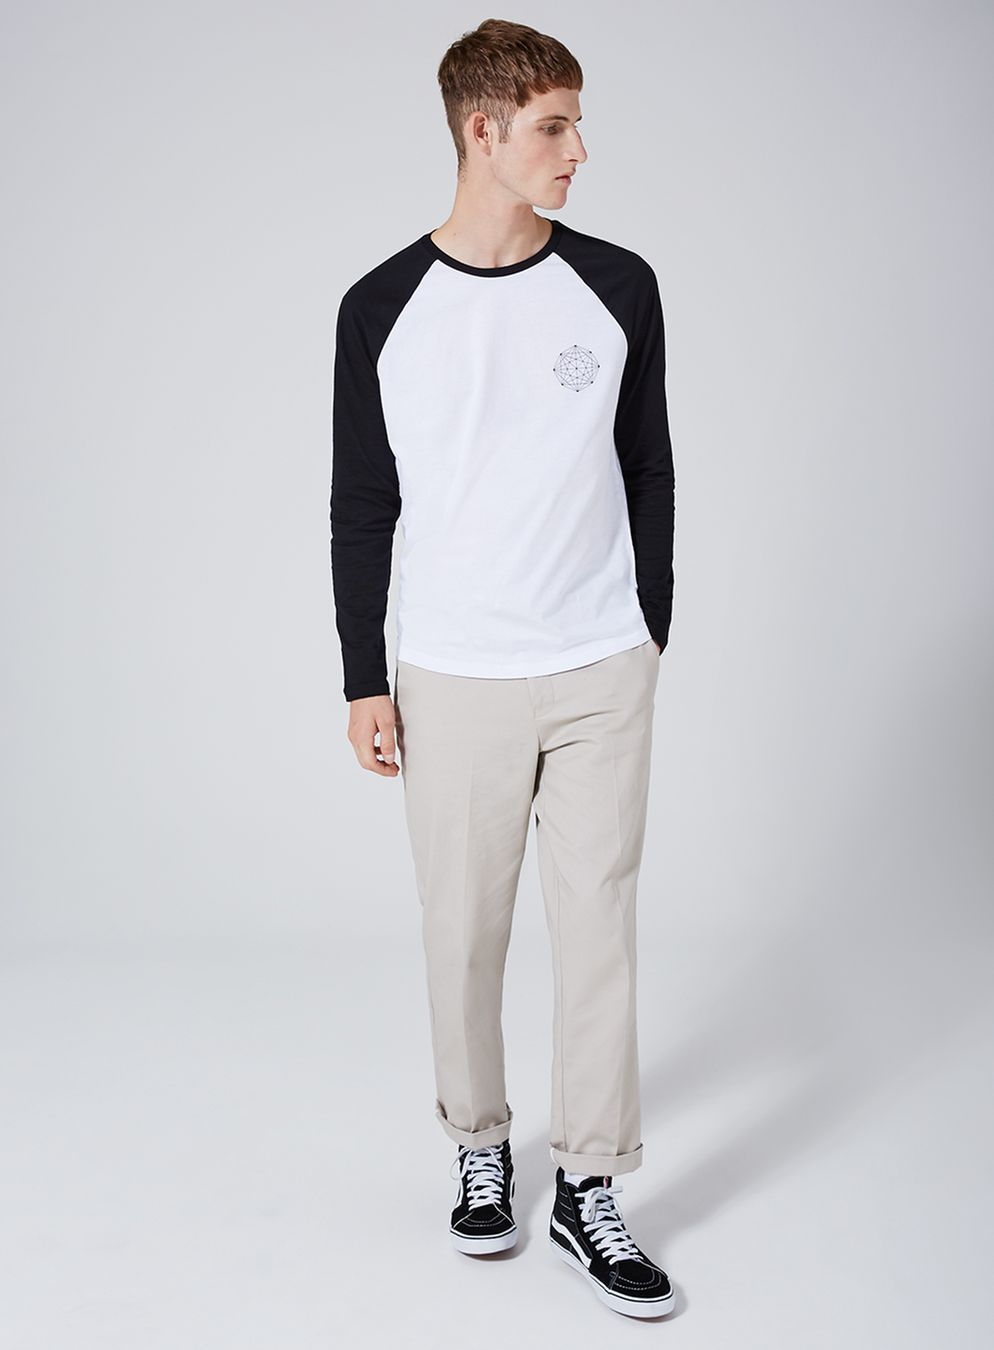 No Name Brand Clothing T Shirts Manufacturers China Long ...